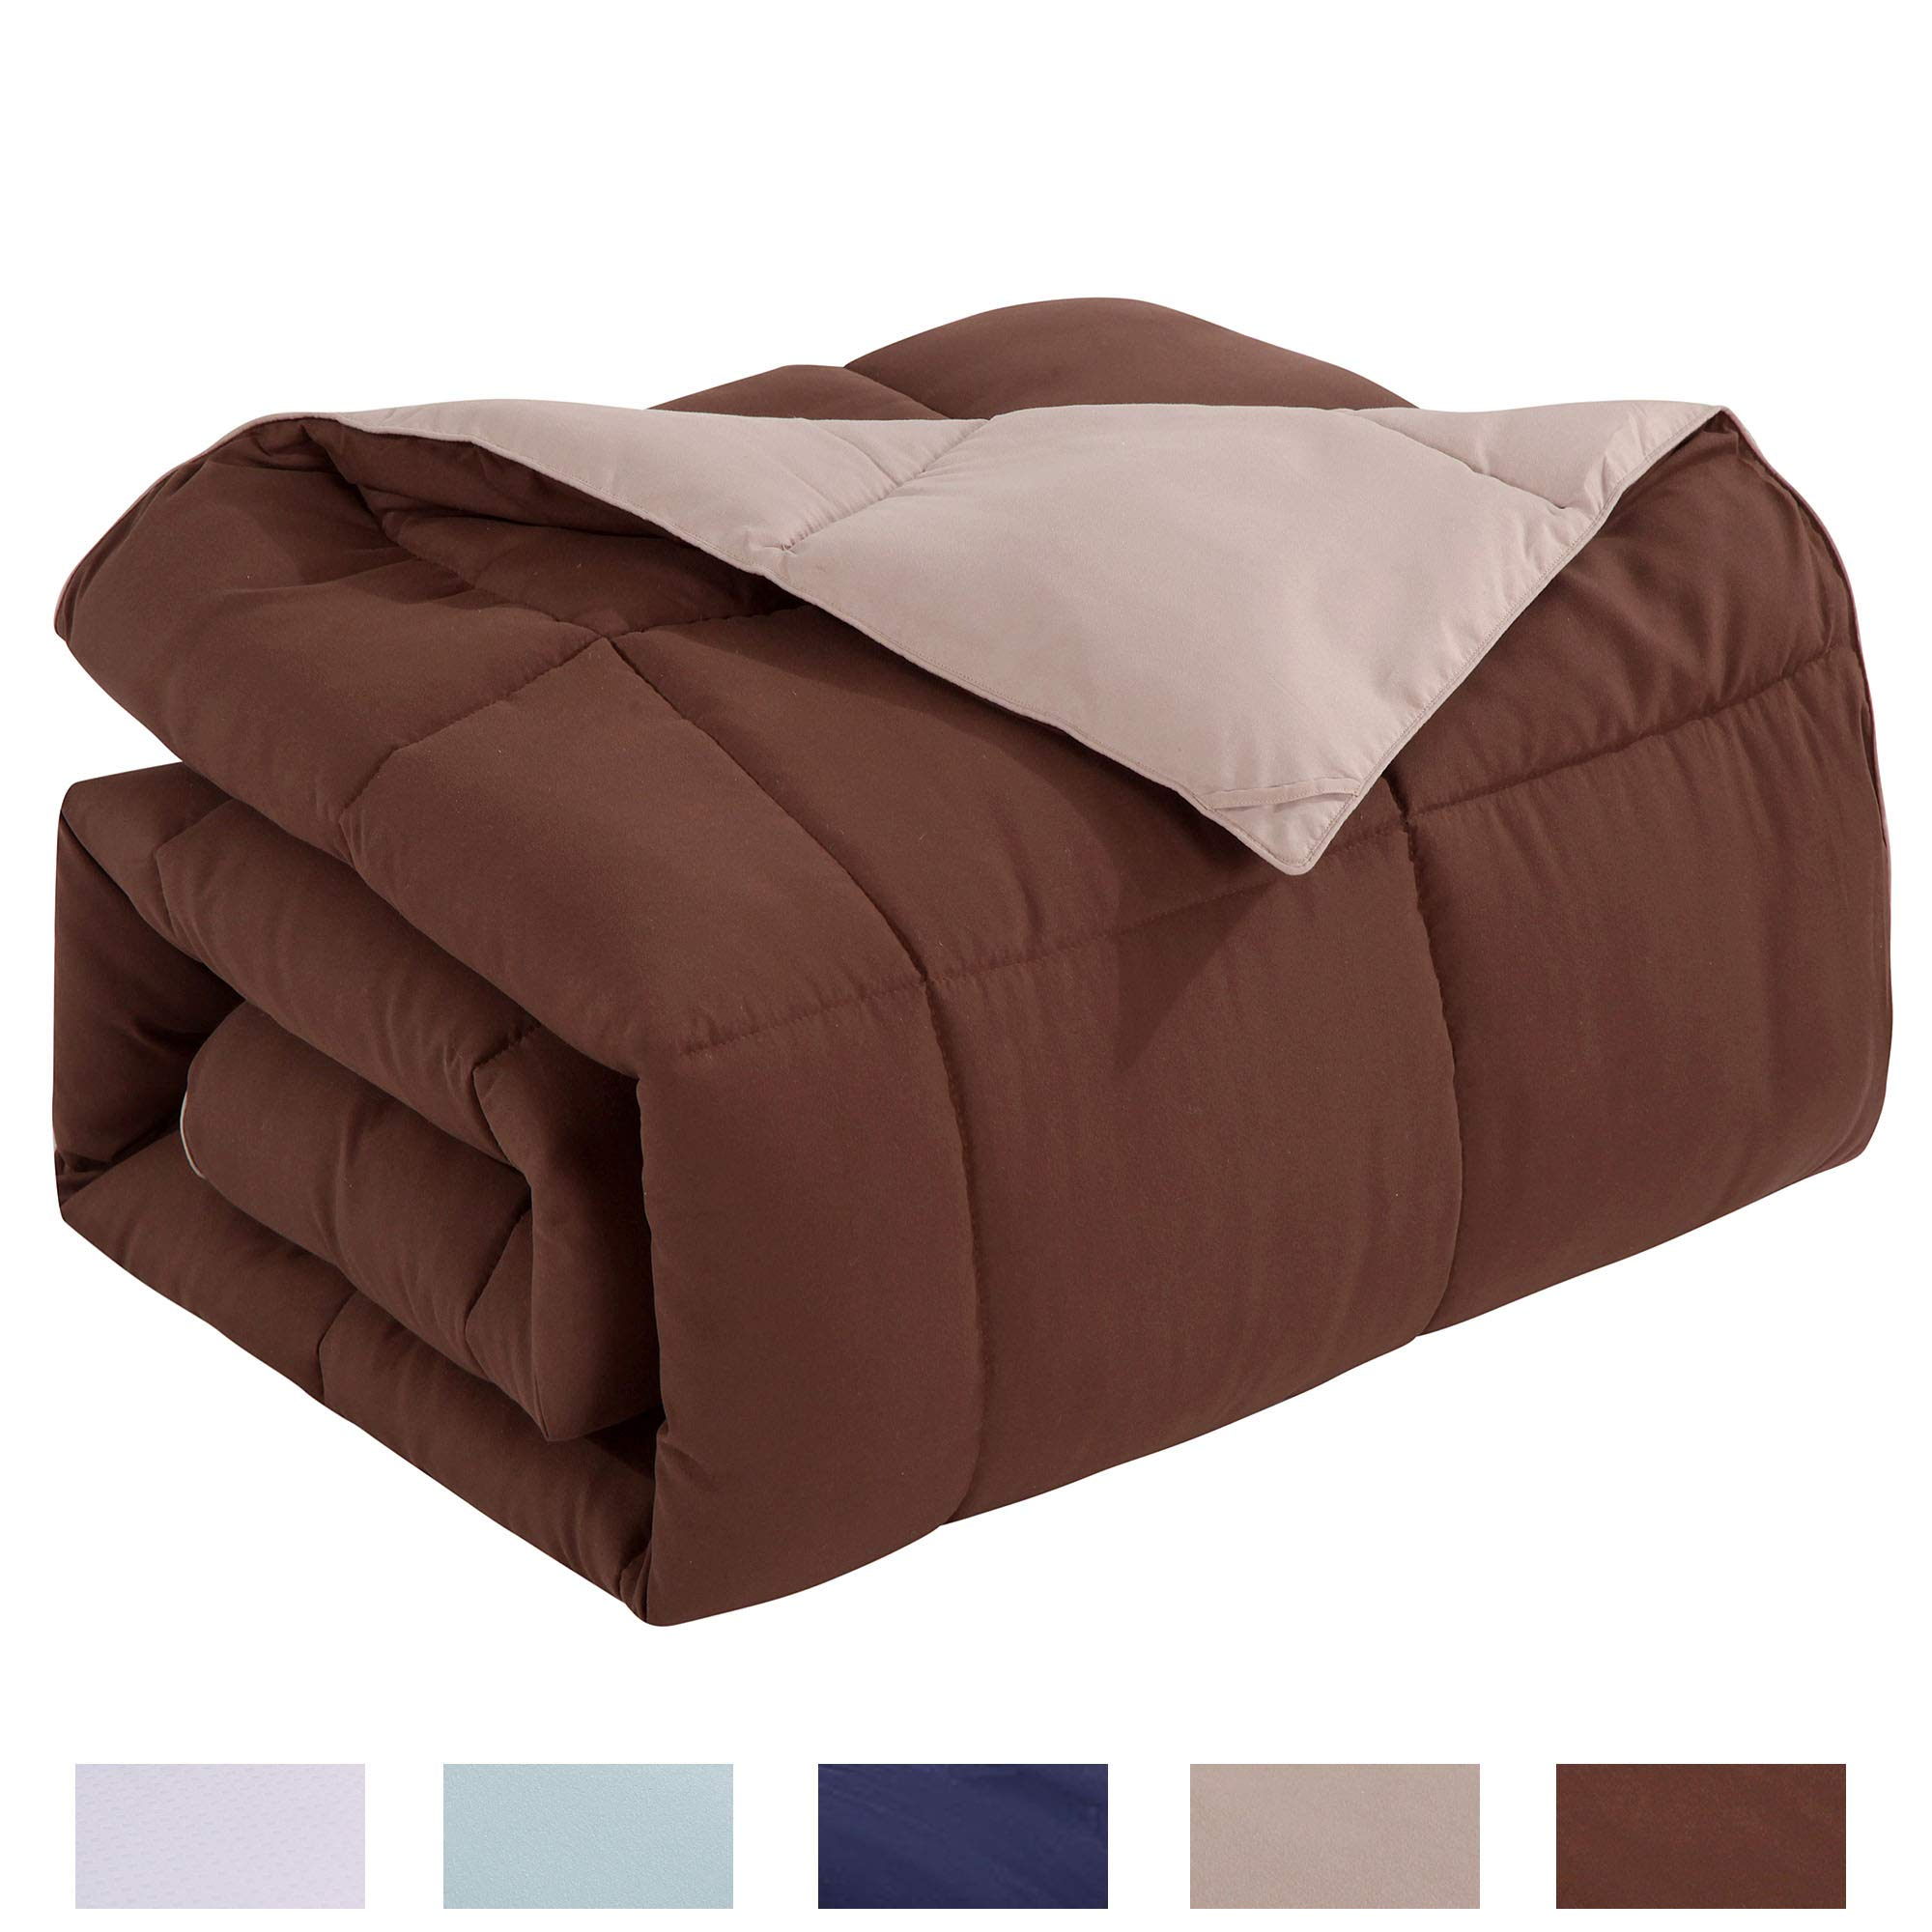 Homelike Moment Lightweight Reversible Comforter Down Alternative Queen All Season Duvet Insert Microfiber Comforter Chocolate Brown/Khaki Full/Queen Size With Corner Tabs Hypoallergenic